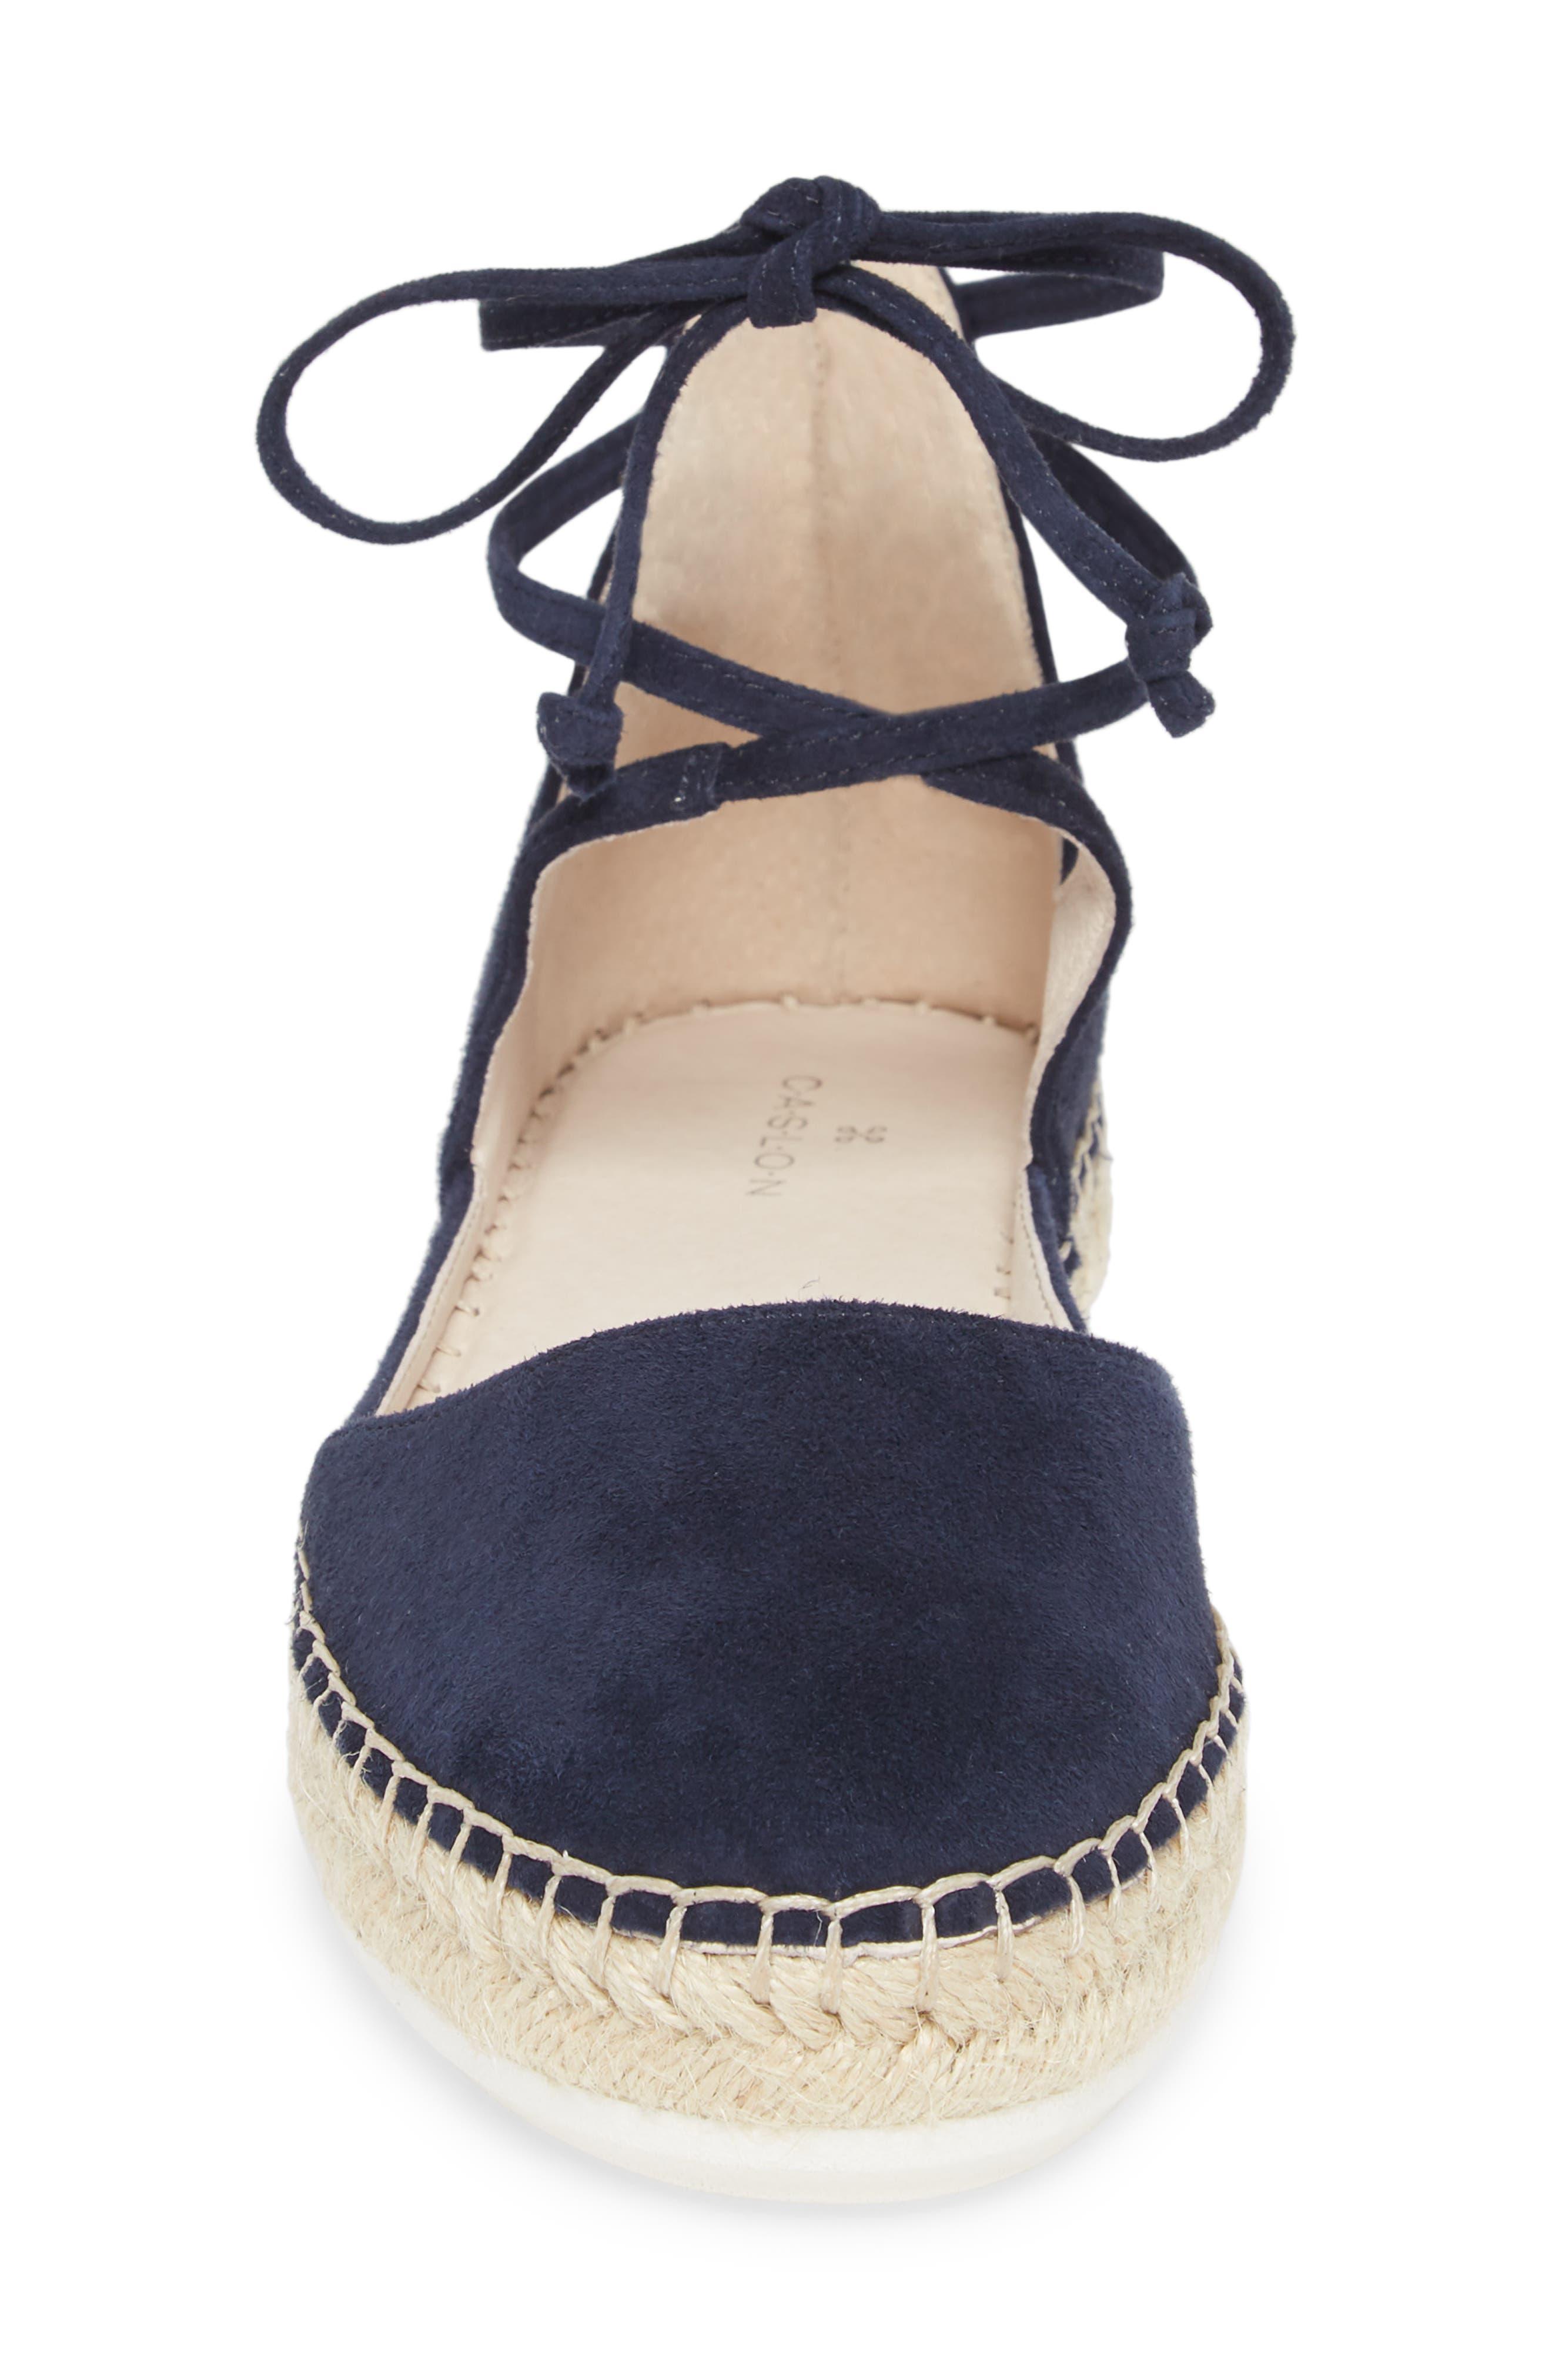 Leena Ankle Strap Sandal,                             Alternate thumbnail 4, color,                             Navy Suede